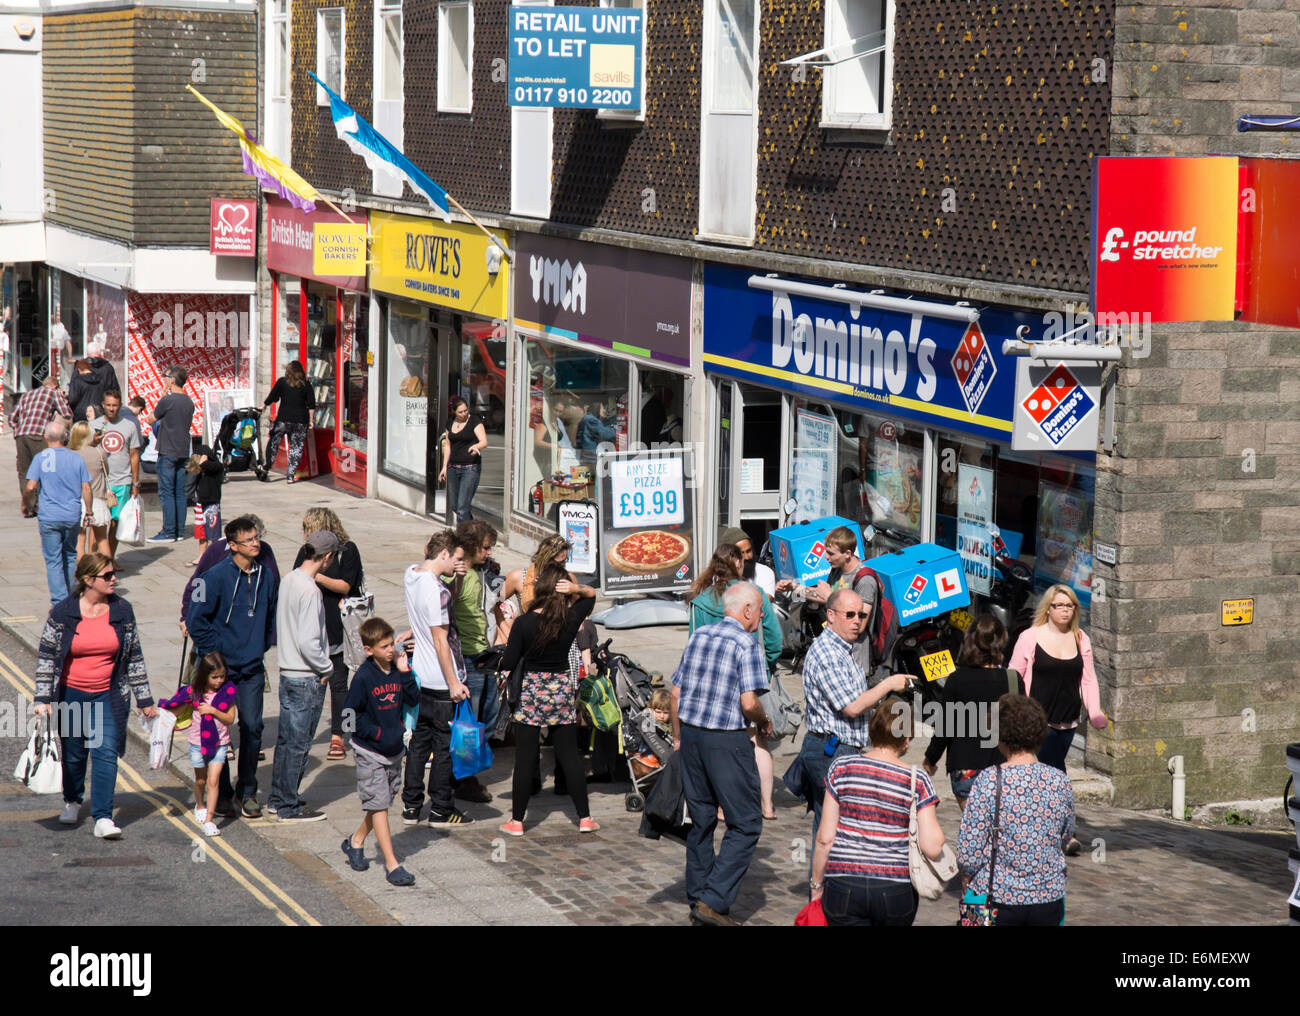 Market Jew Street Penzance Cornwall England UK   Holiday makers shopping - Stock Image